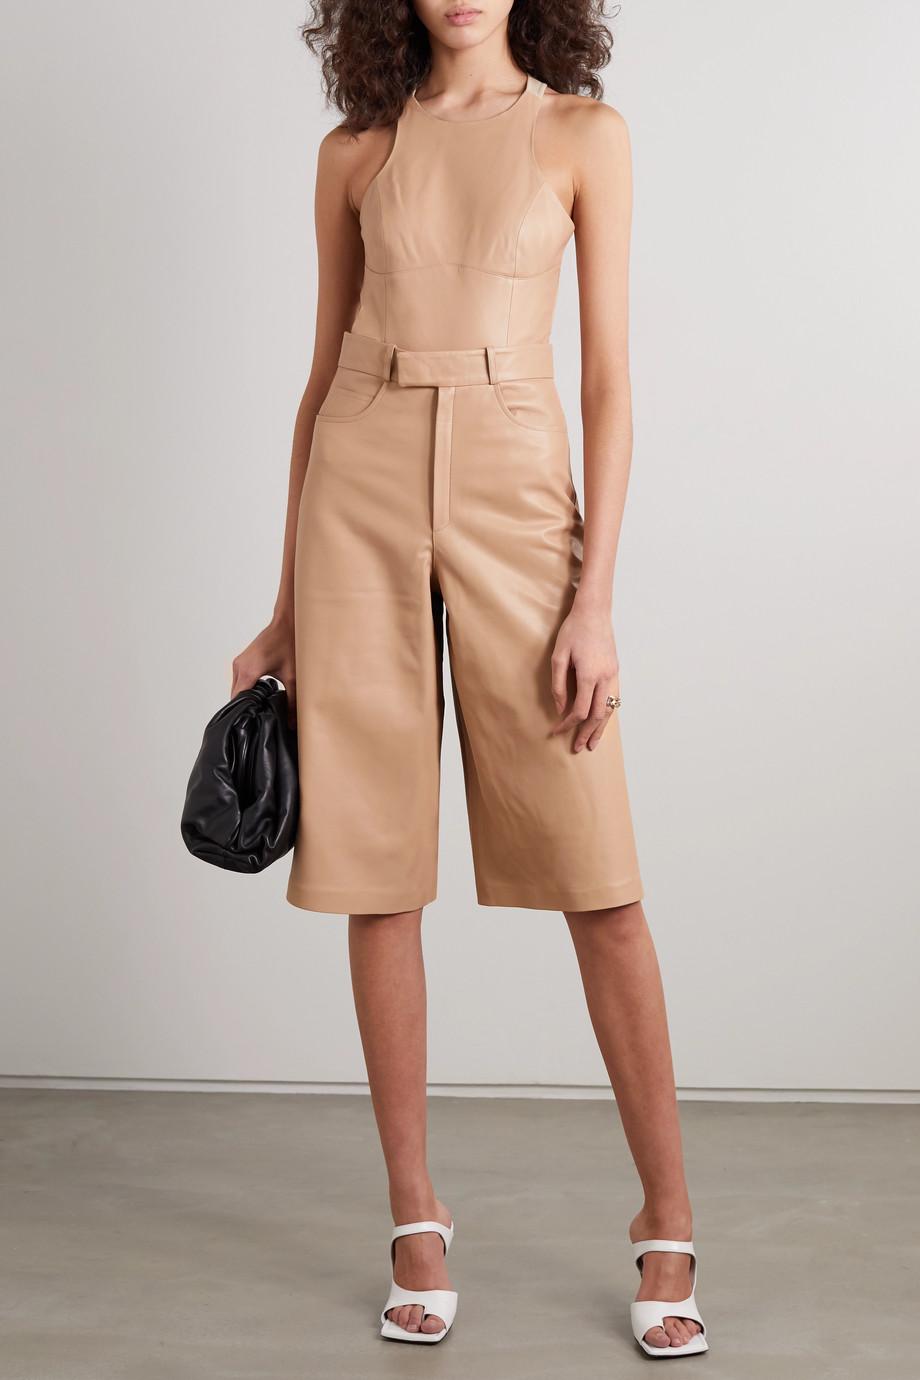 Zeynep Arcay Cutout leather and stretch-knit bodysuit